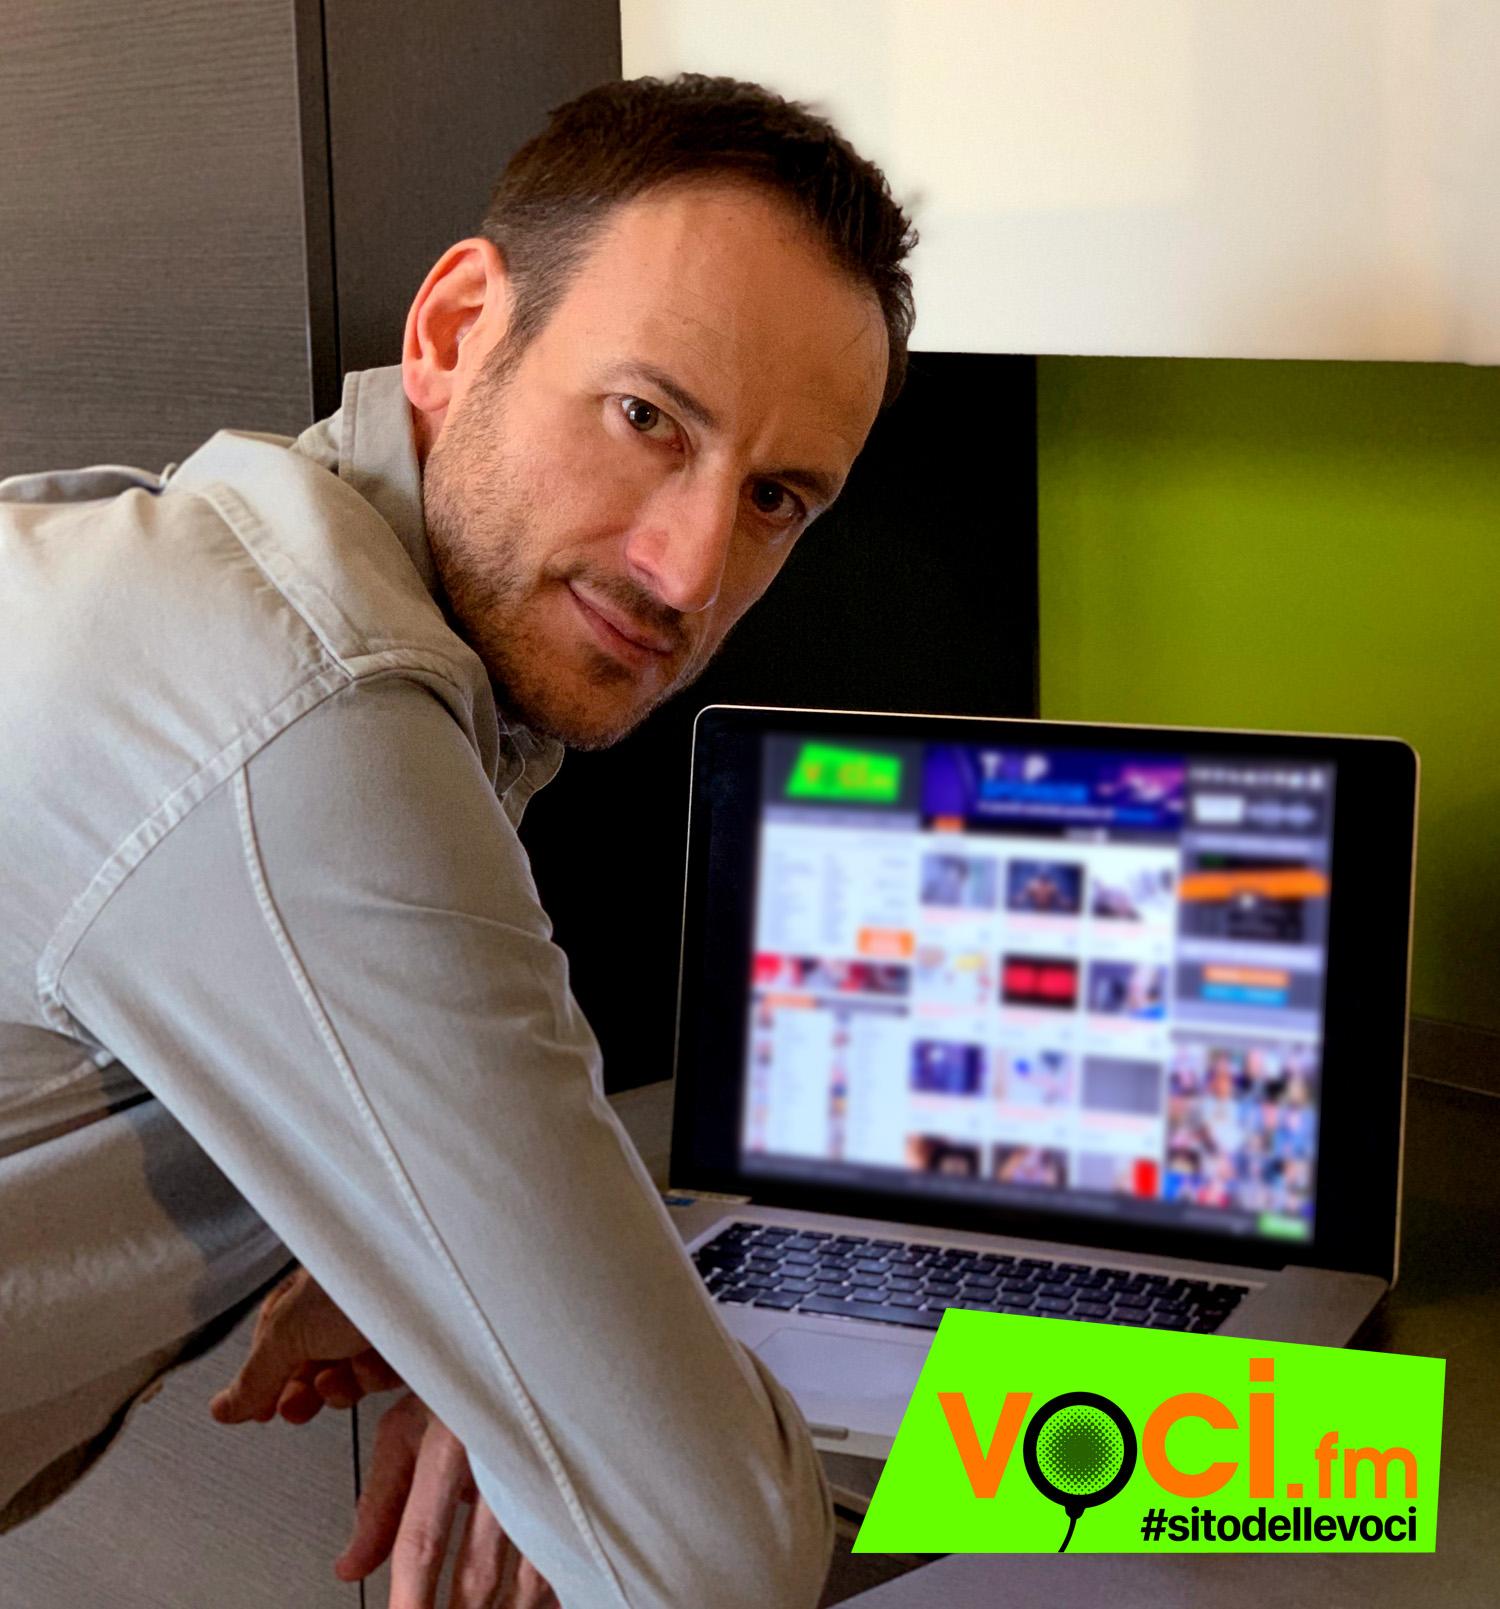 VOCI.fm-nuovo sito VOCI.fm-matteo mattiacci-matteo mattiacci VOCI.fm-consulenza radiofonica-nuovo logo-servizi VOCI.fm-matteo mattiacci ceo voci.fm